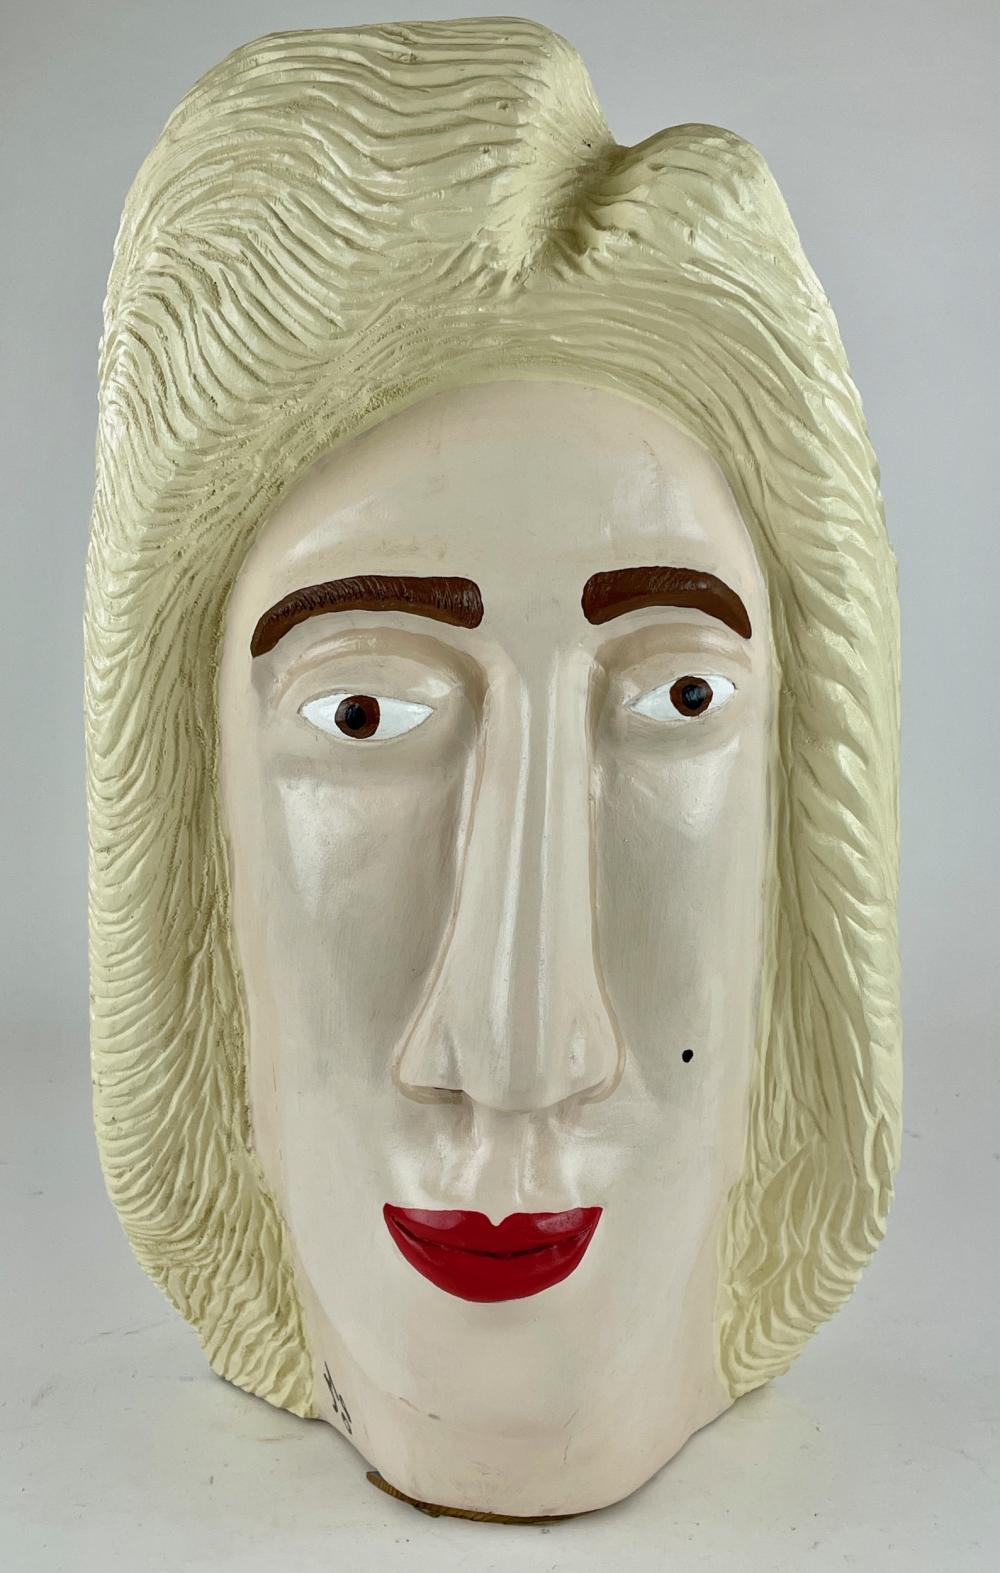 Joe McCuaig Monumental Marilyn Monroe Carving